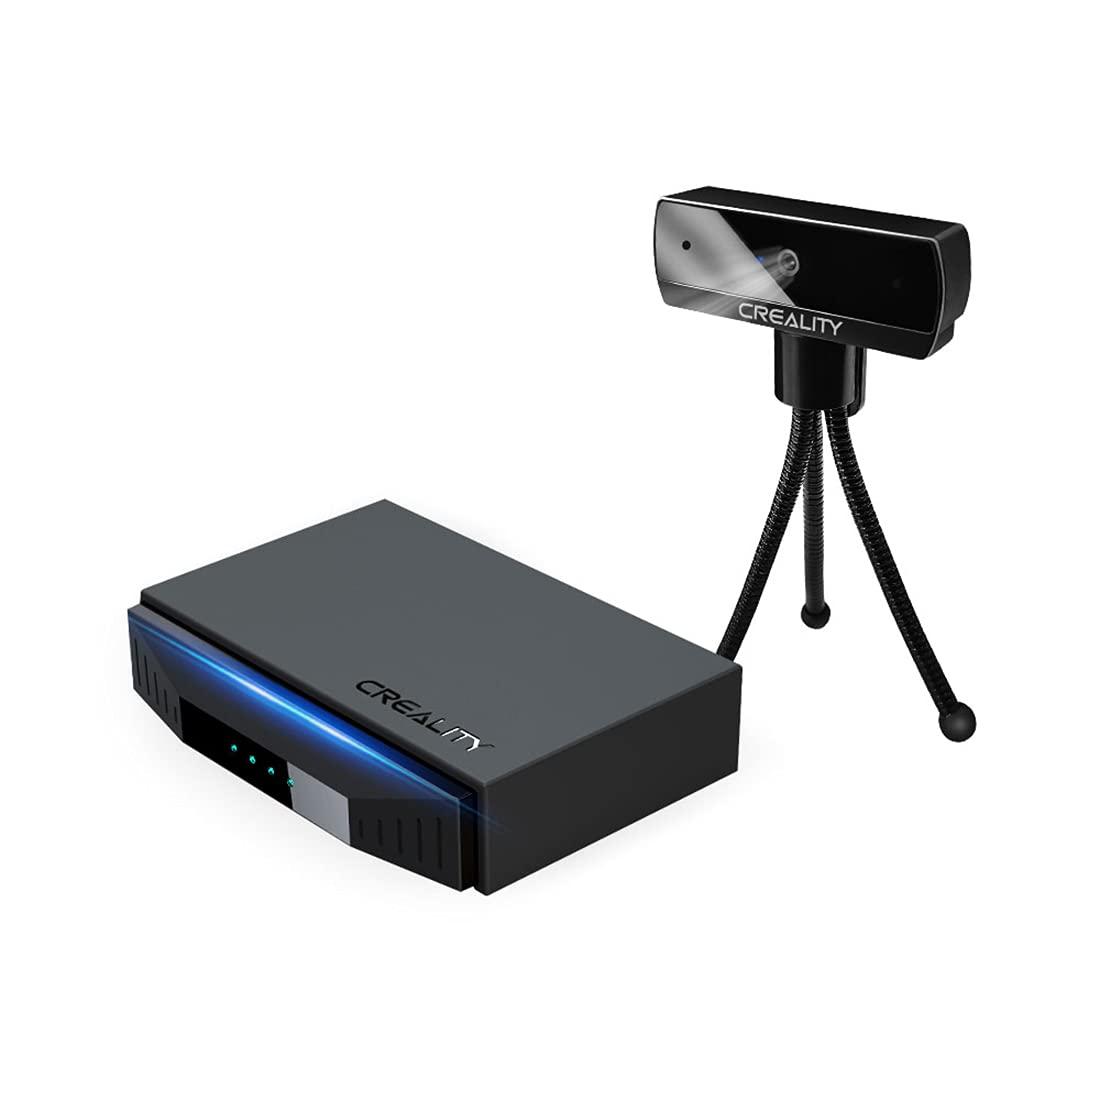 Creality Smart Kit Camera WiFi Box Compatible with Windows/Linux/Mac (Standard Version)